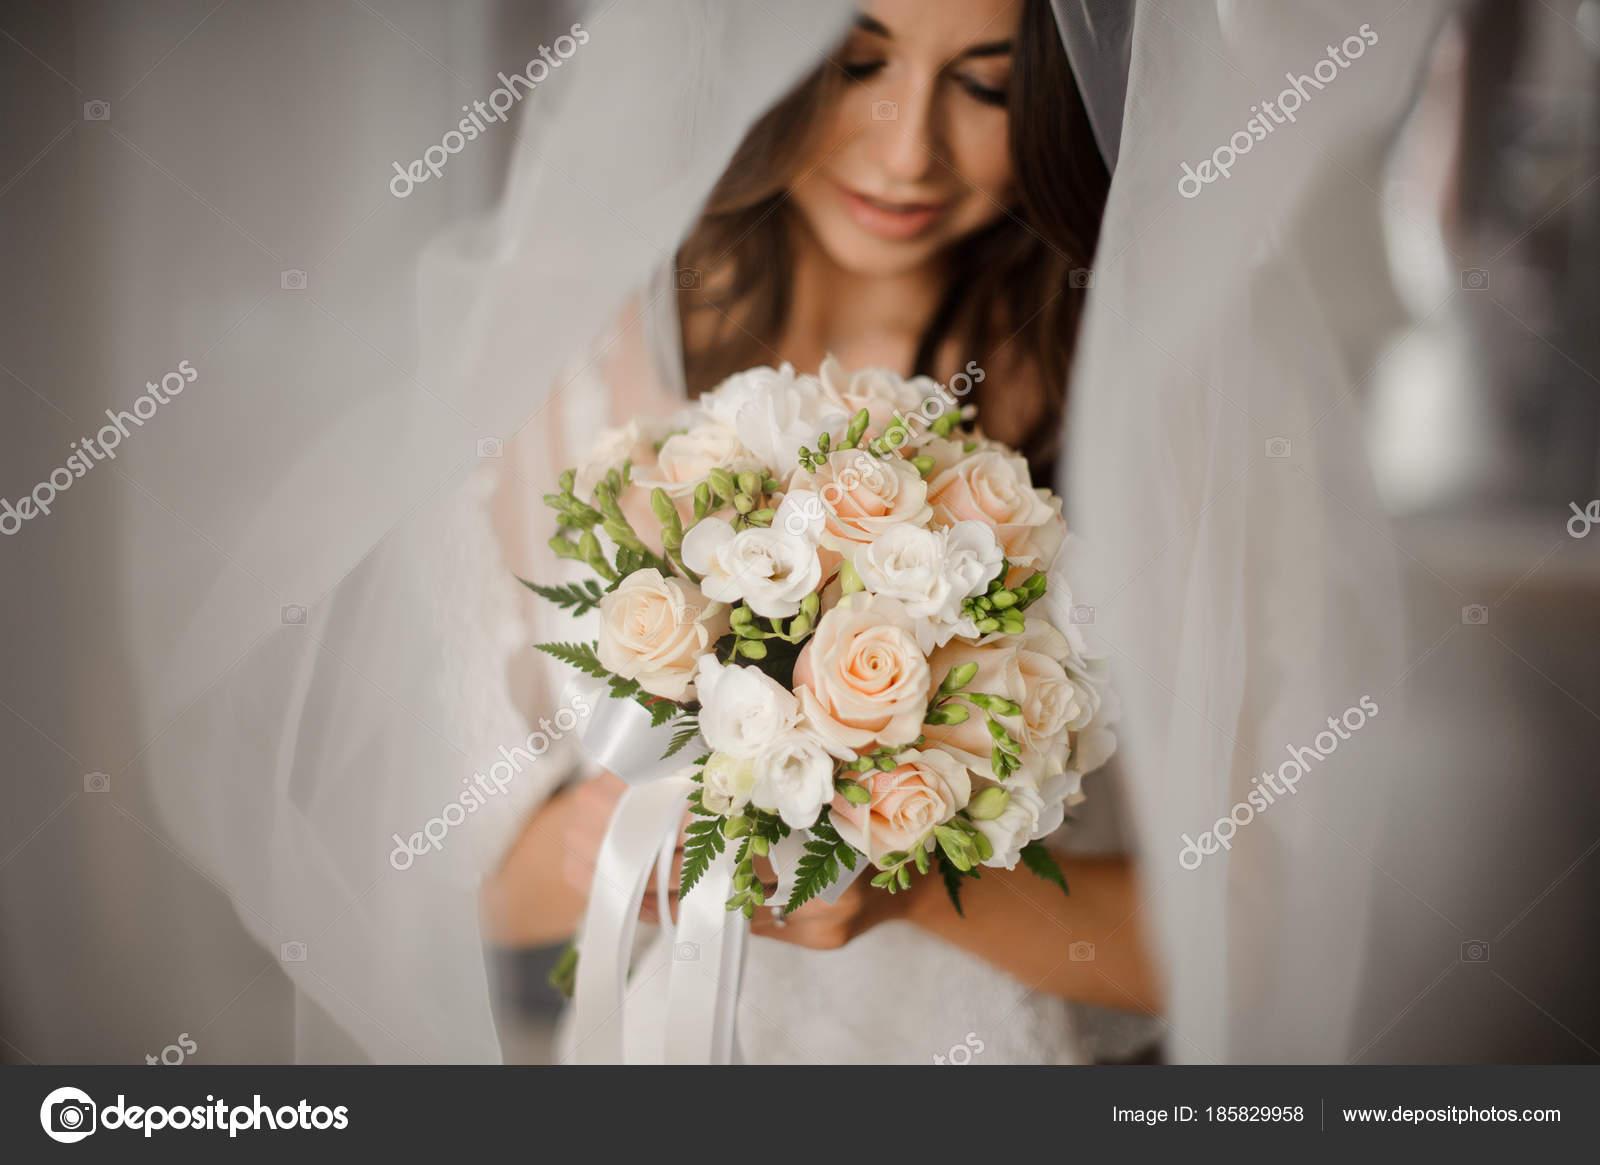 8bcad667c89 Προετοιμασία νύφης το πρωί. Πορτρέτο του όμορφη νύφη σε ένα λευκό ...